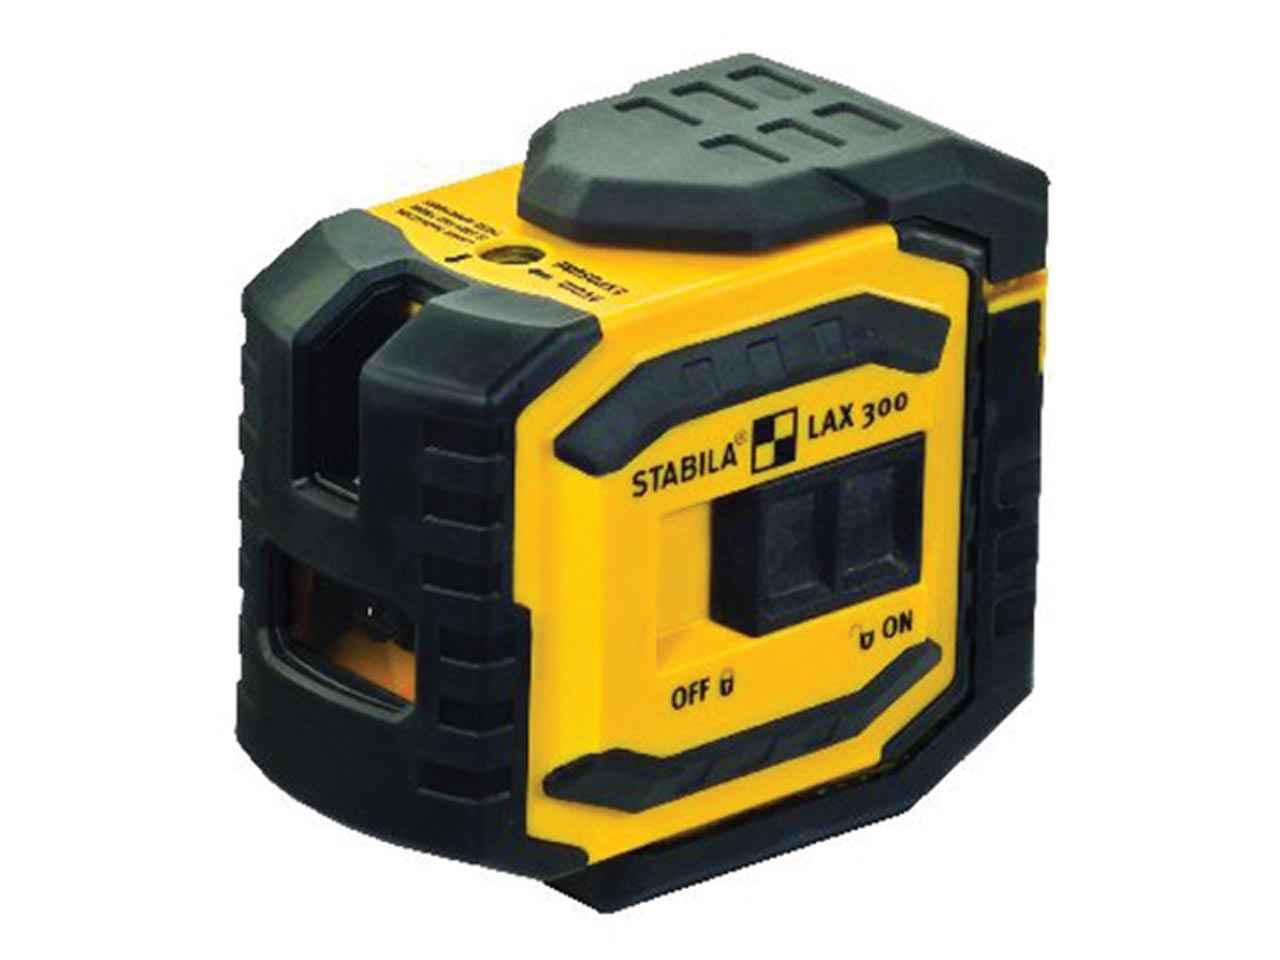 STBLAX300.JPG